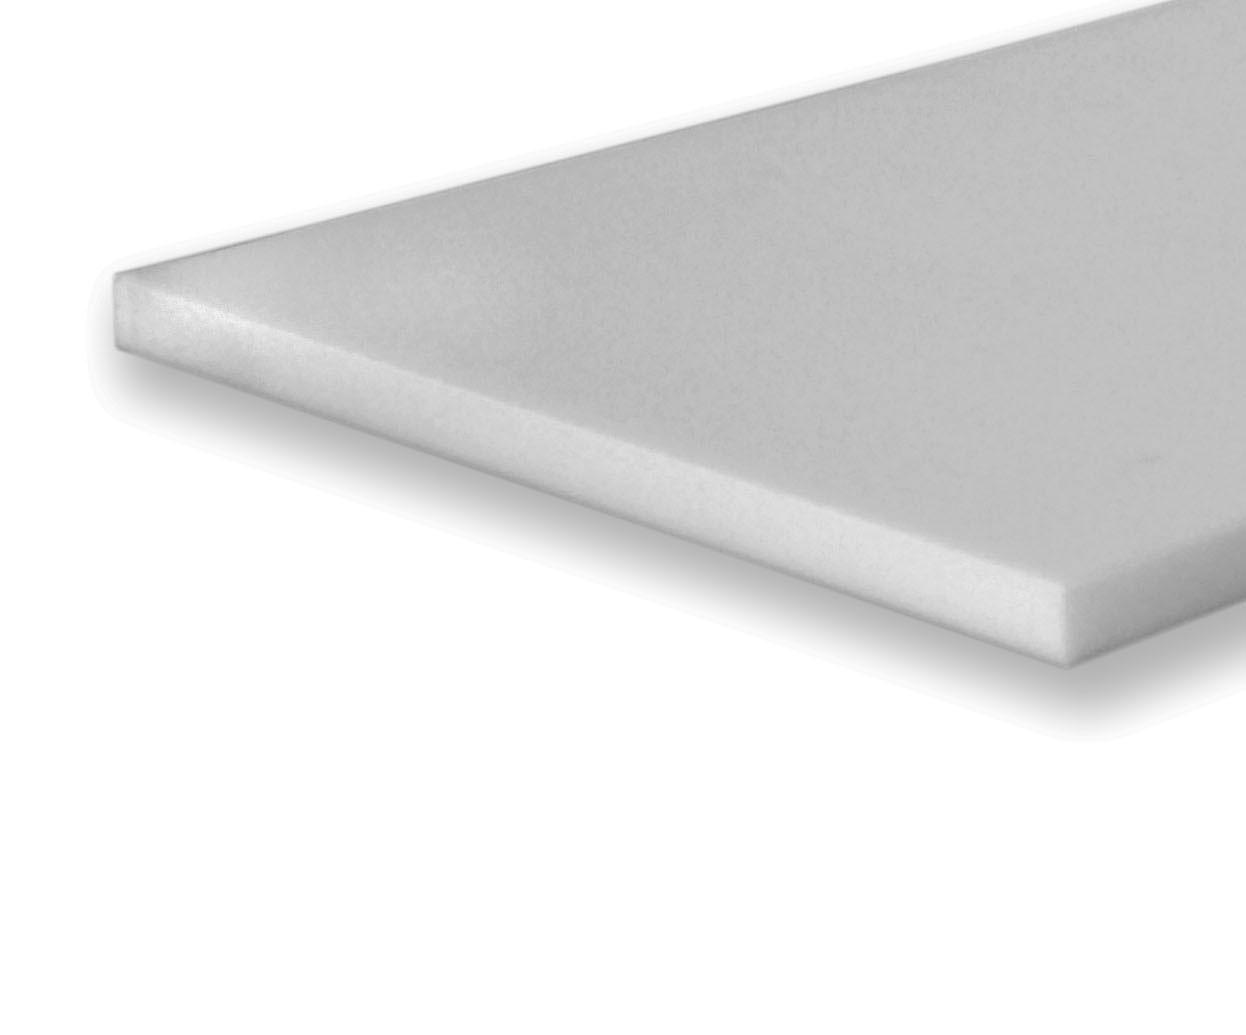 basotect platte 58x58x4cm wei grau kaufen. Black Bedroom Furniture Sets. Home Design Ideas